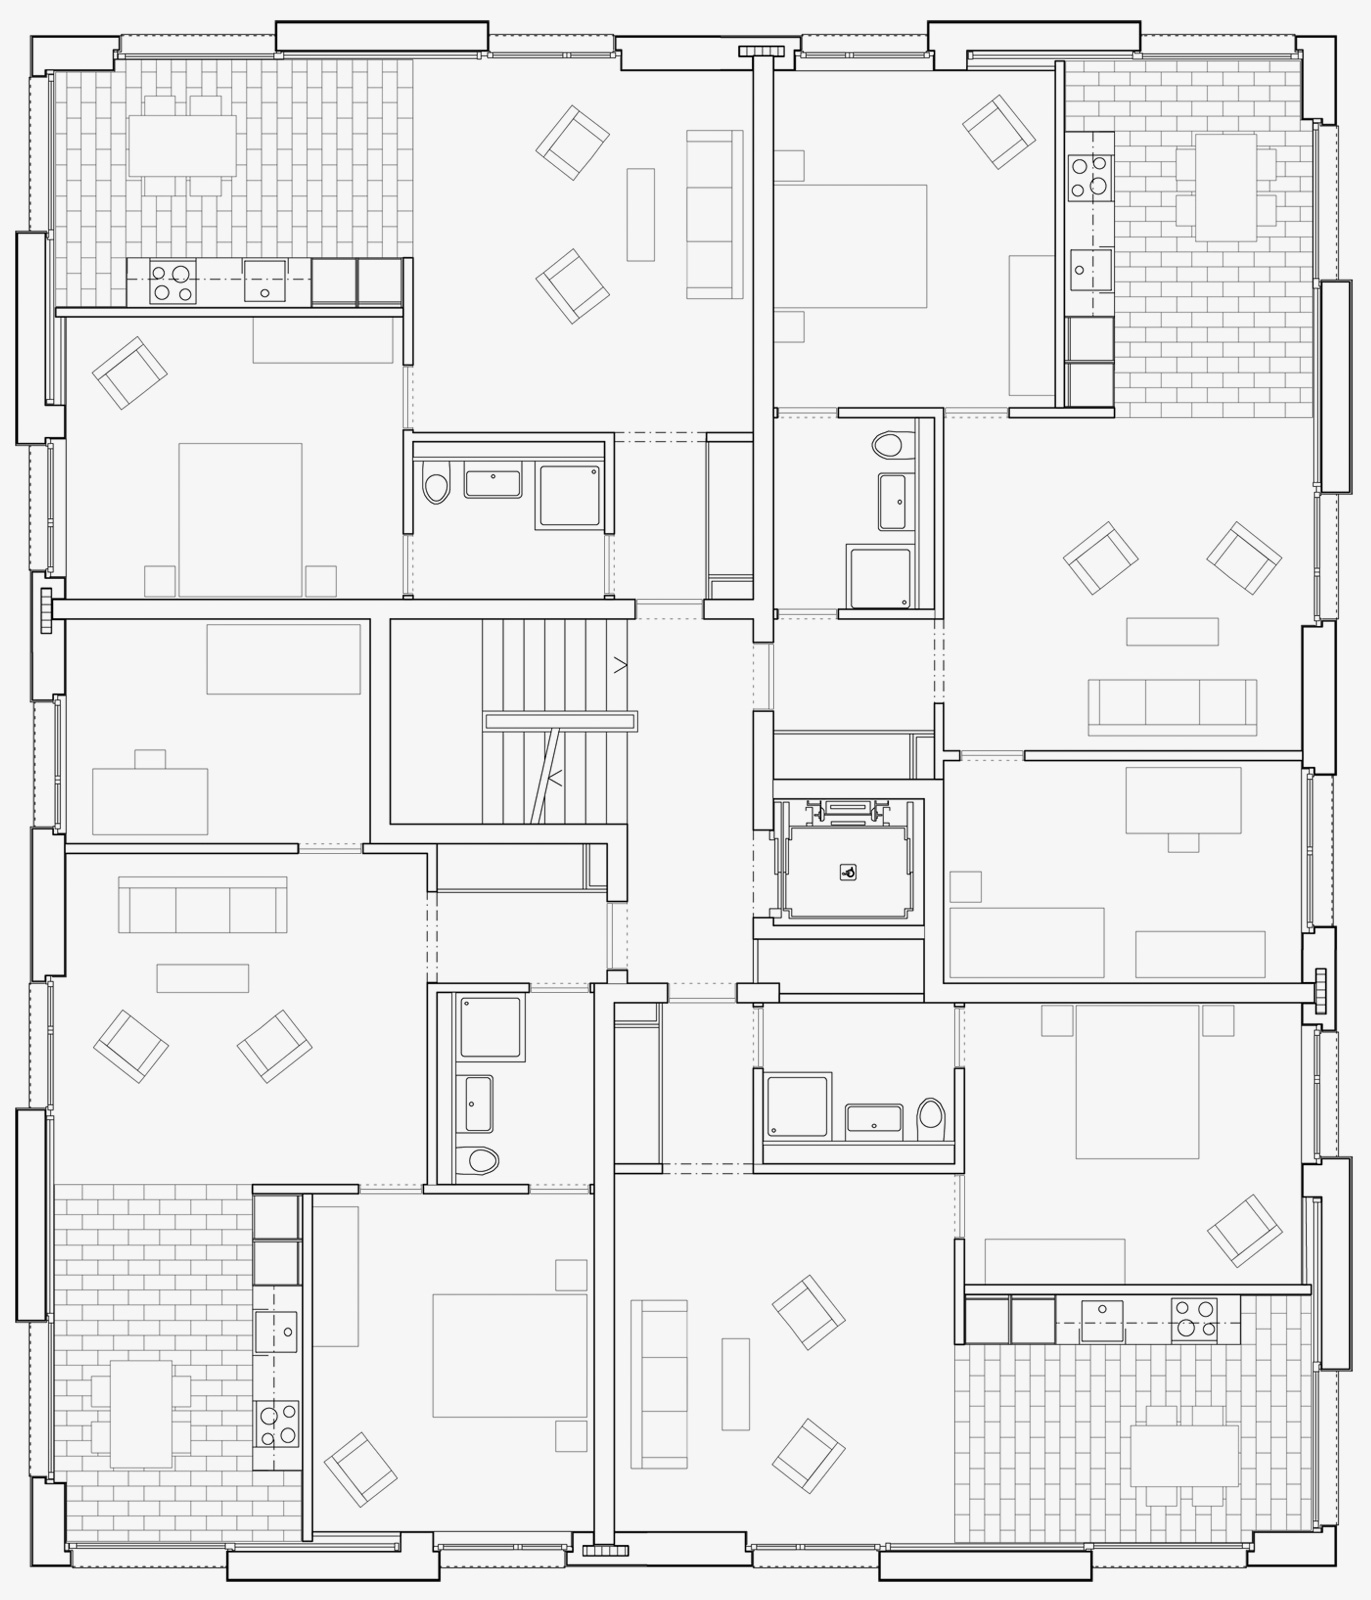 Grundriss Prototyp Fur Affordable Housing Haus Adimora